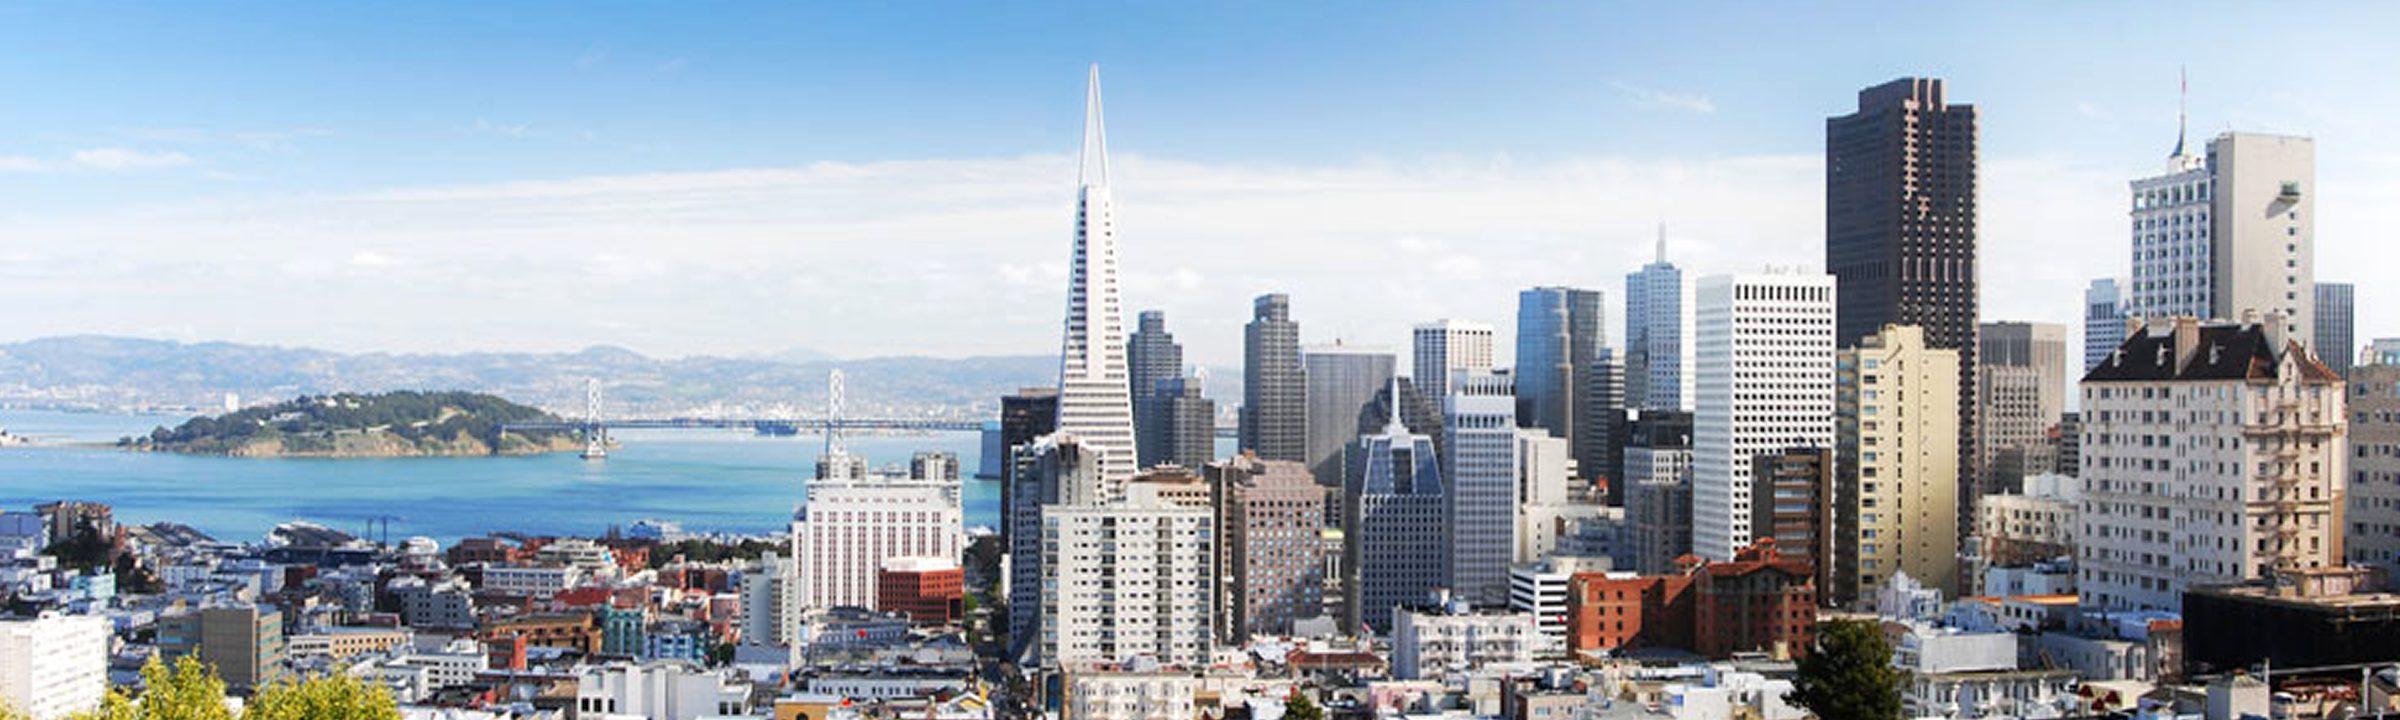 Photo of downtown San Francisco